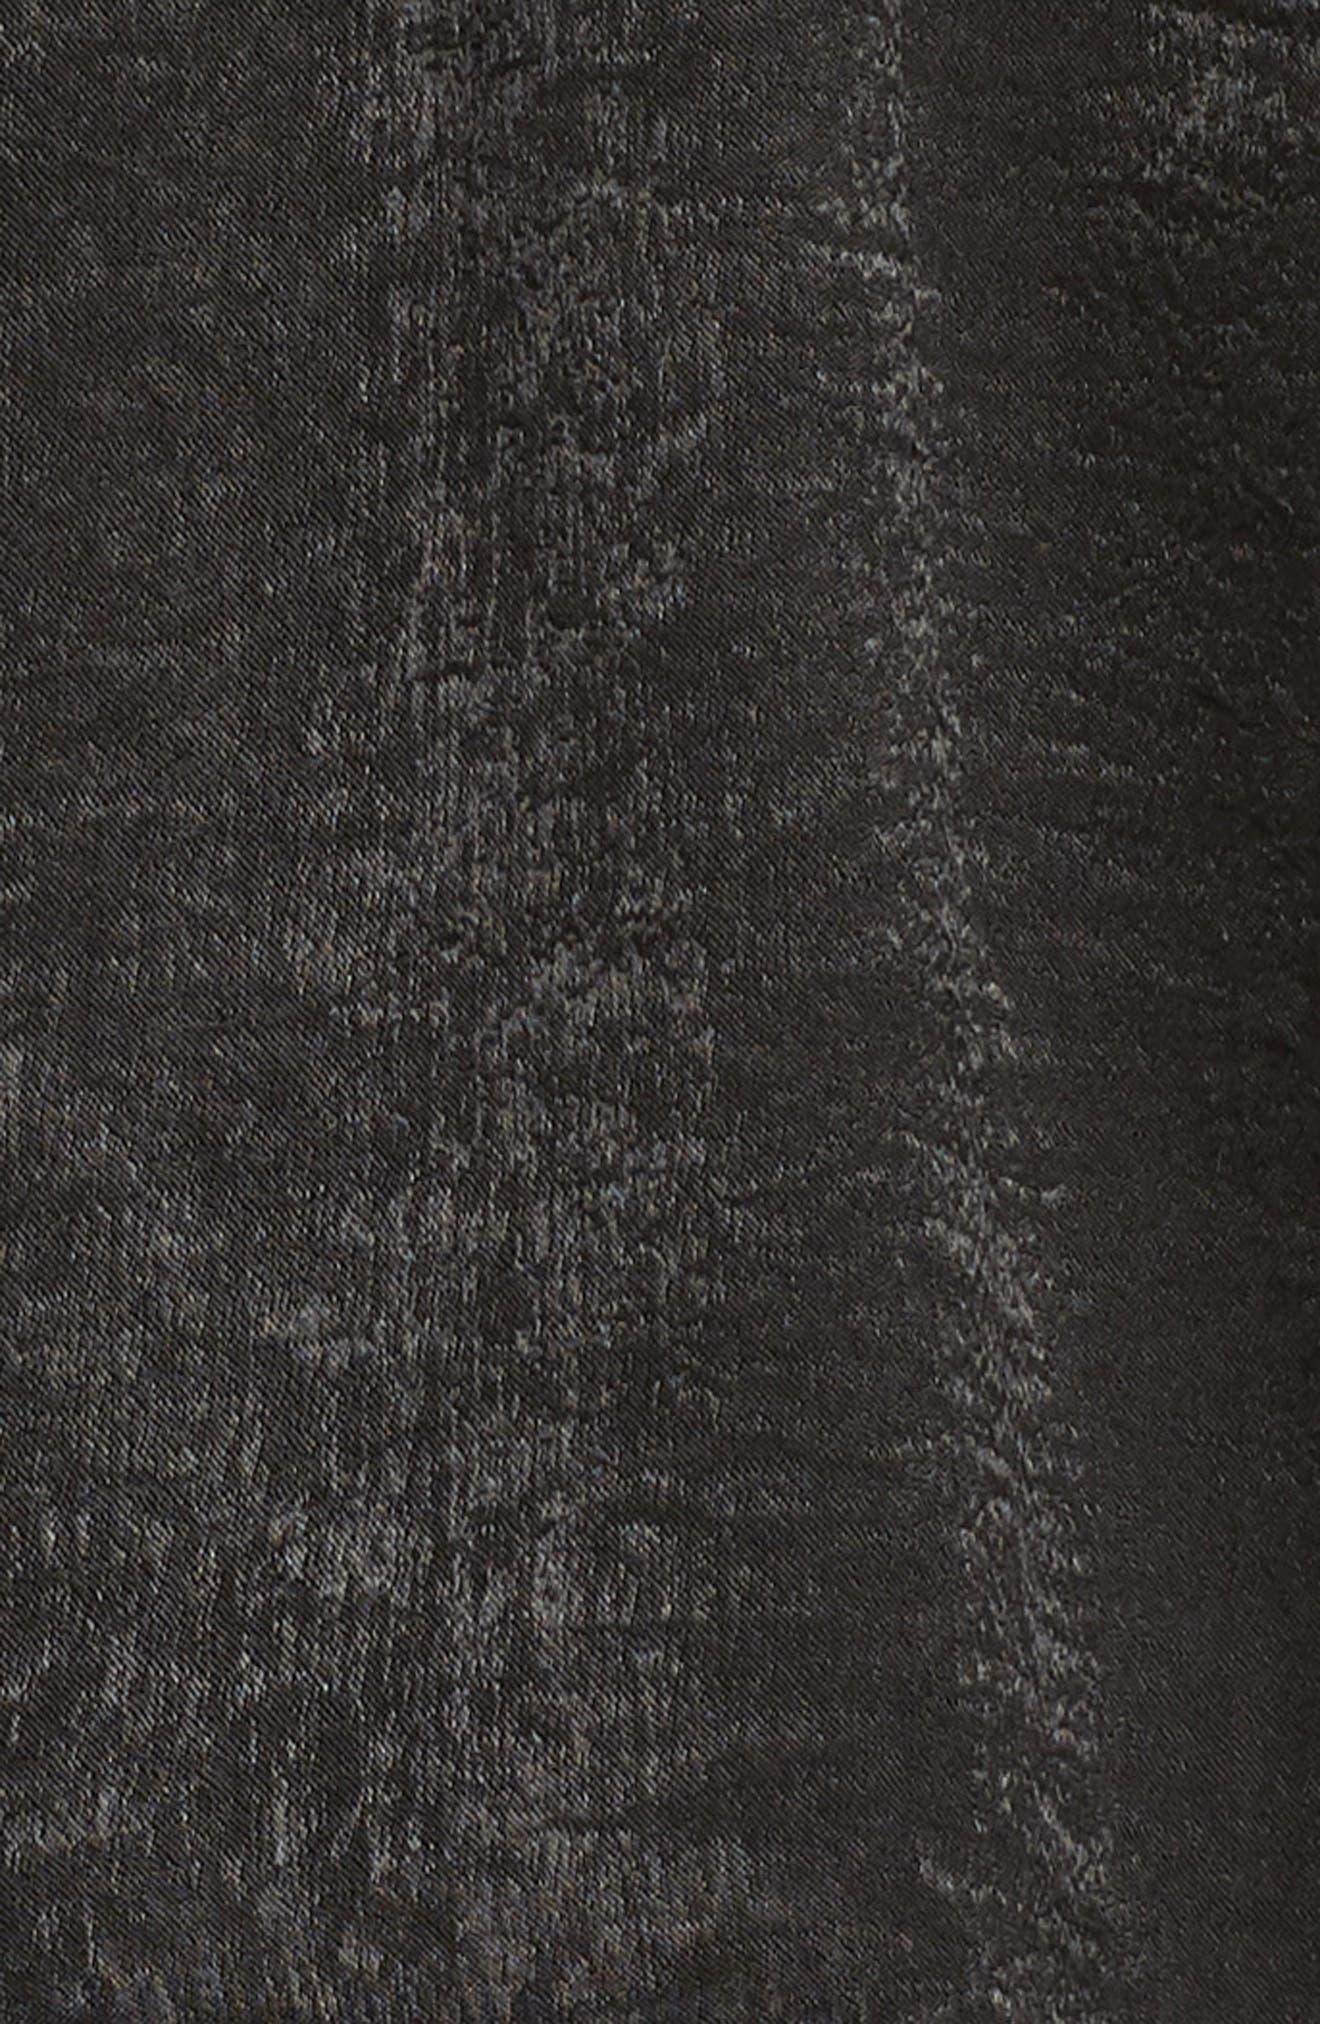 Dulce Minidress,                             Alternate thumbnail 6, color,                             Black Sheen